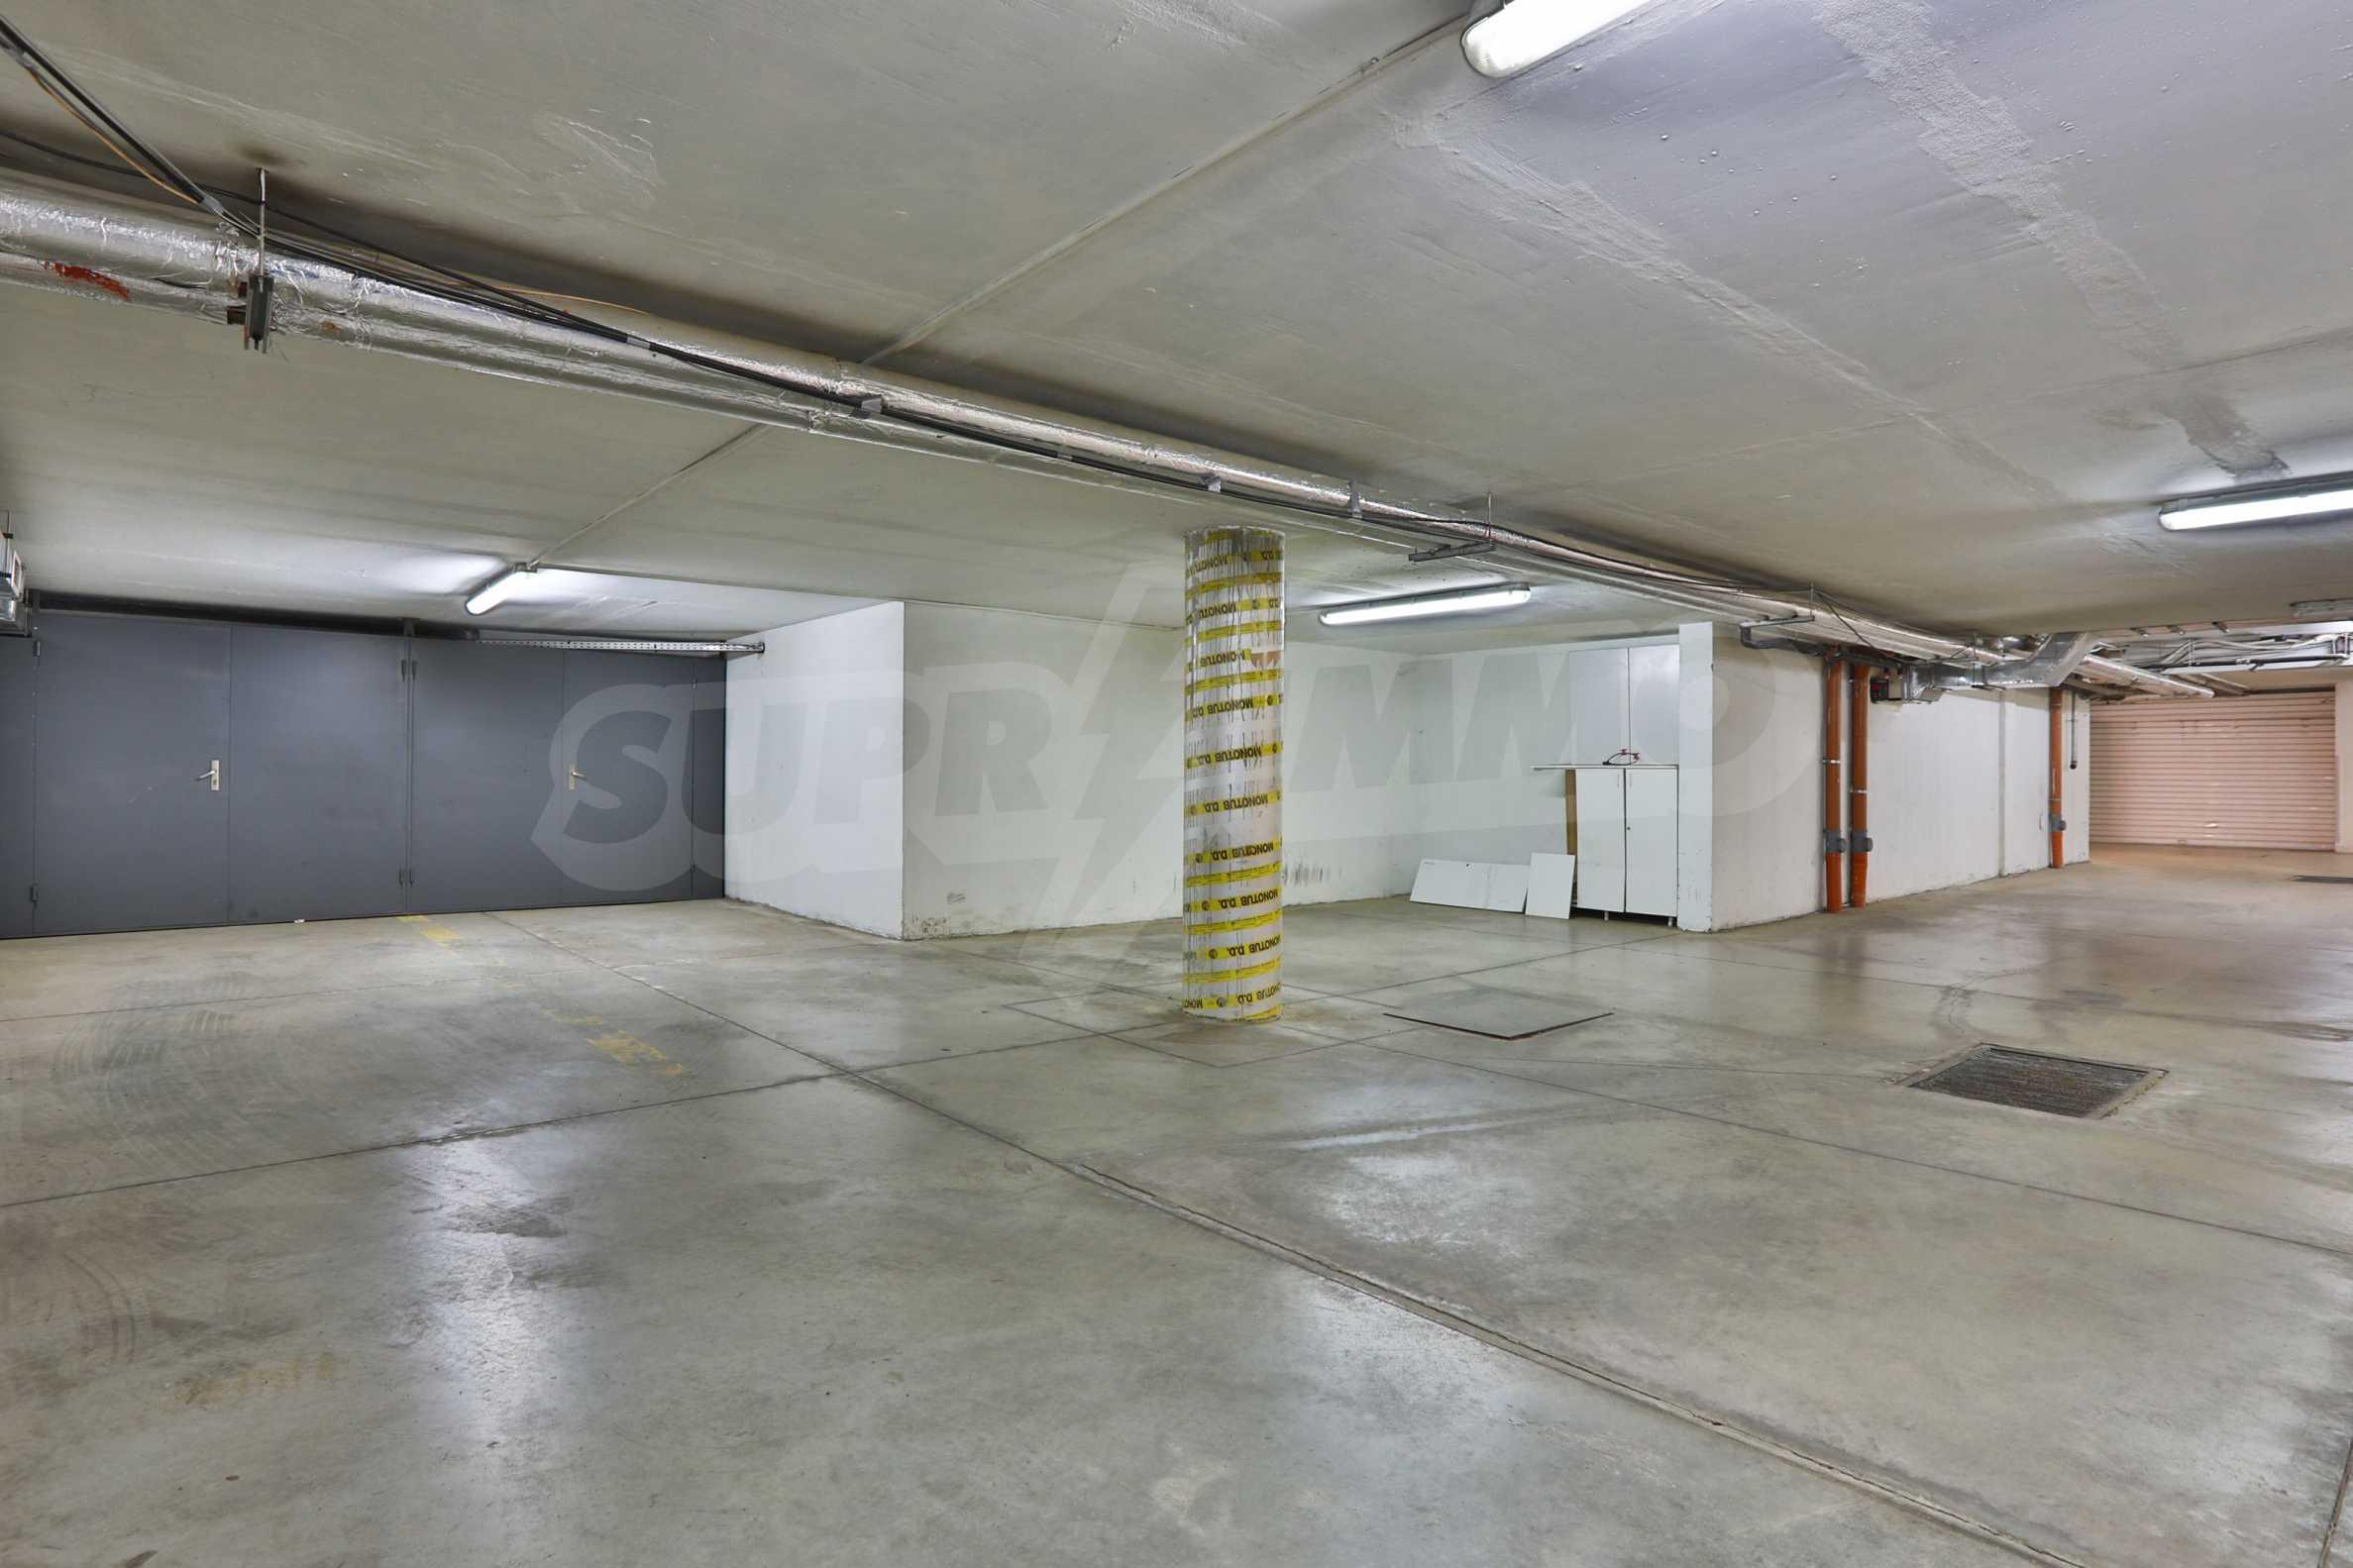 Панорамен пентхаус с подземни паркоместа, кв. Лозенец 19